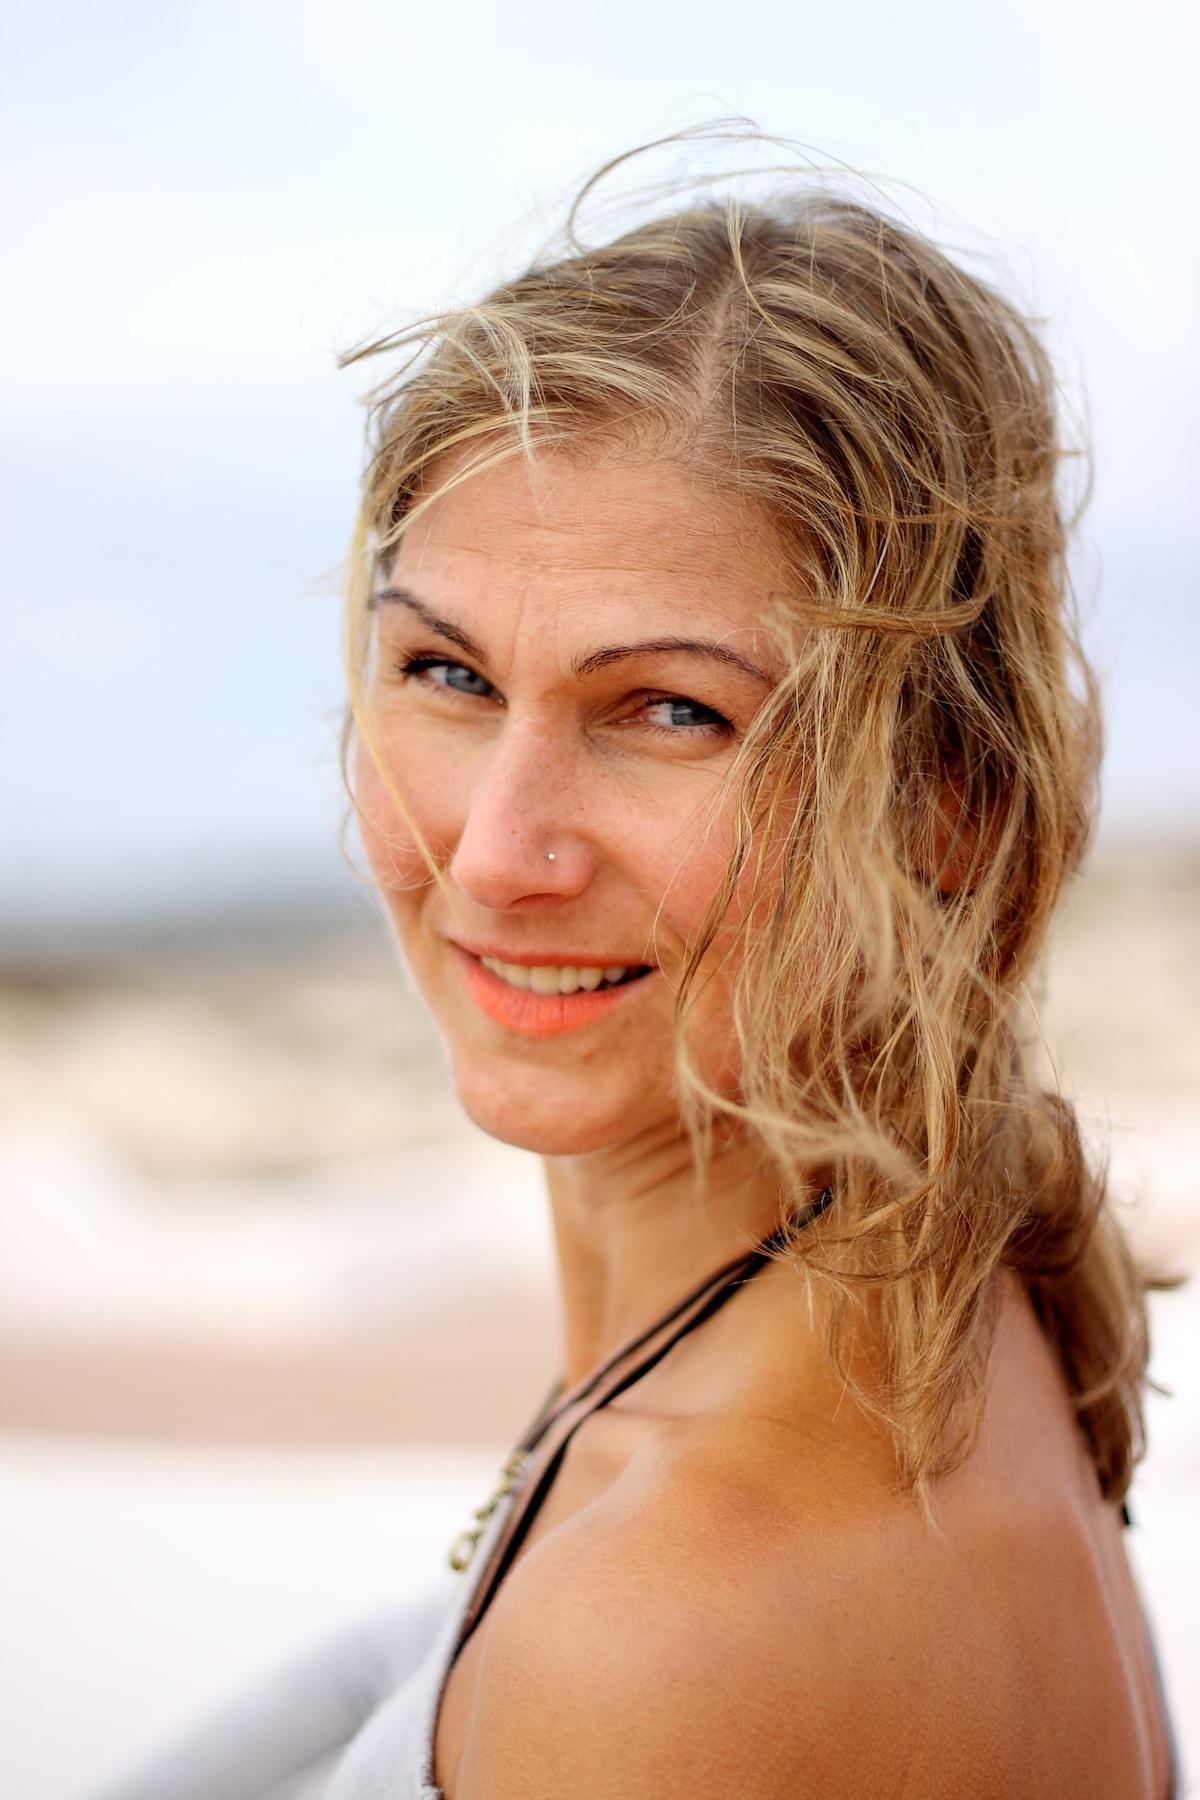 Anja from Berlin